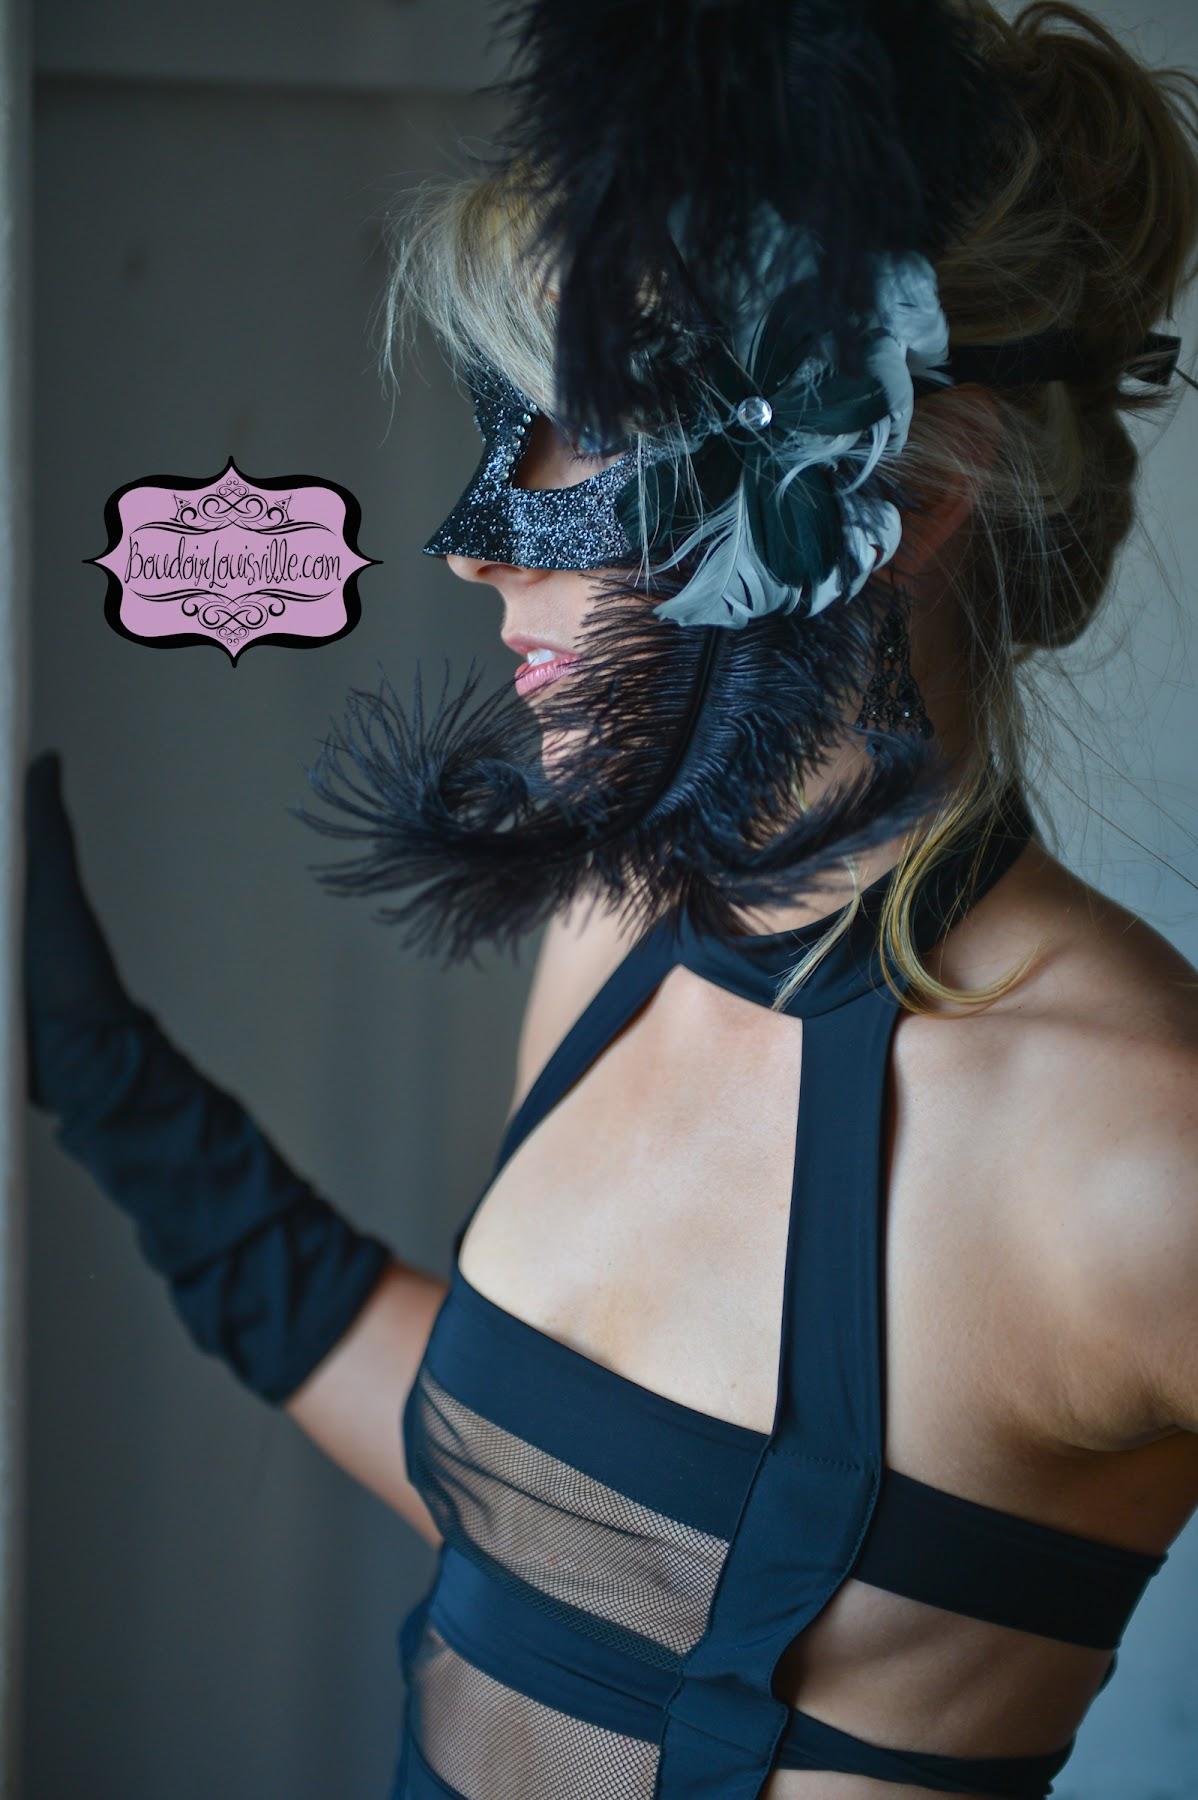 http://1.bp.blogspot.com/-Hj8jsidIQK8/UHwf_0e600I/AAAAAAAAJJA/g1CcxQoP86Y/s1800/50+shades+of+gray+boudoir+photo+shoot+-+Boudoir+Louisville-8.jpg